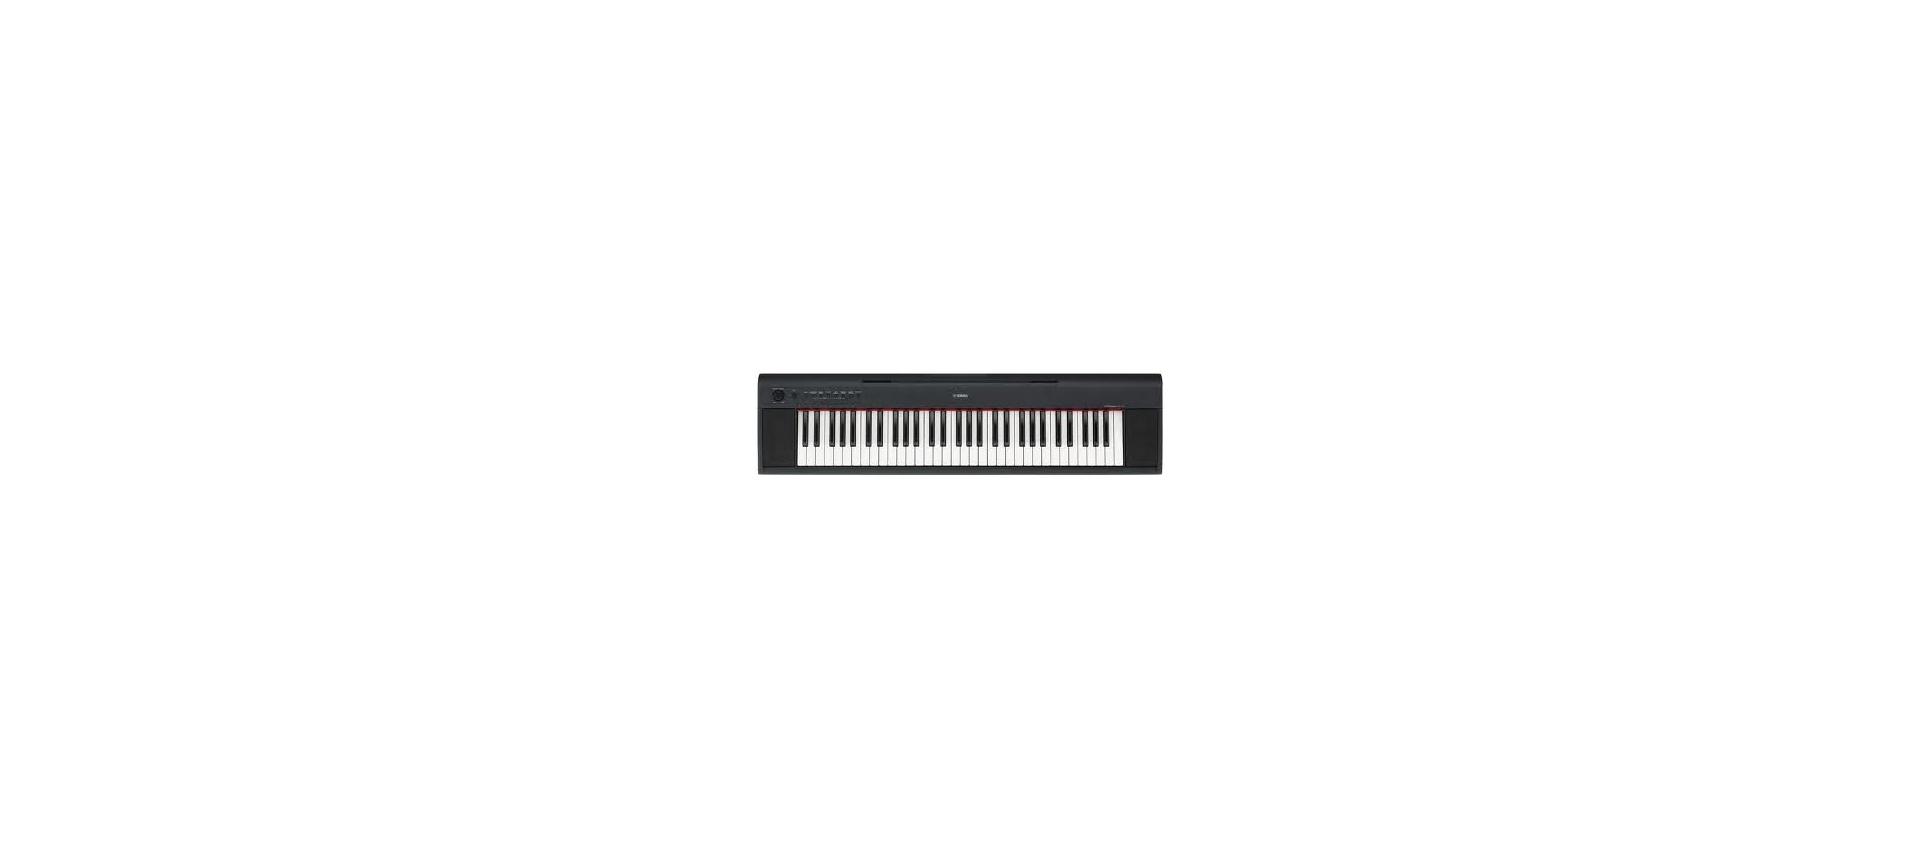 Yamaha np11 digital piano 61 keys compatti for Yamaha np11 digital piano